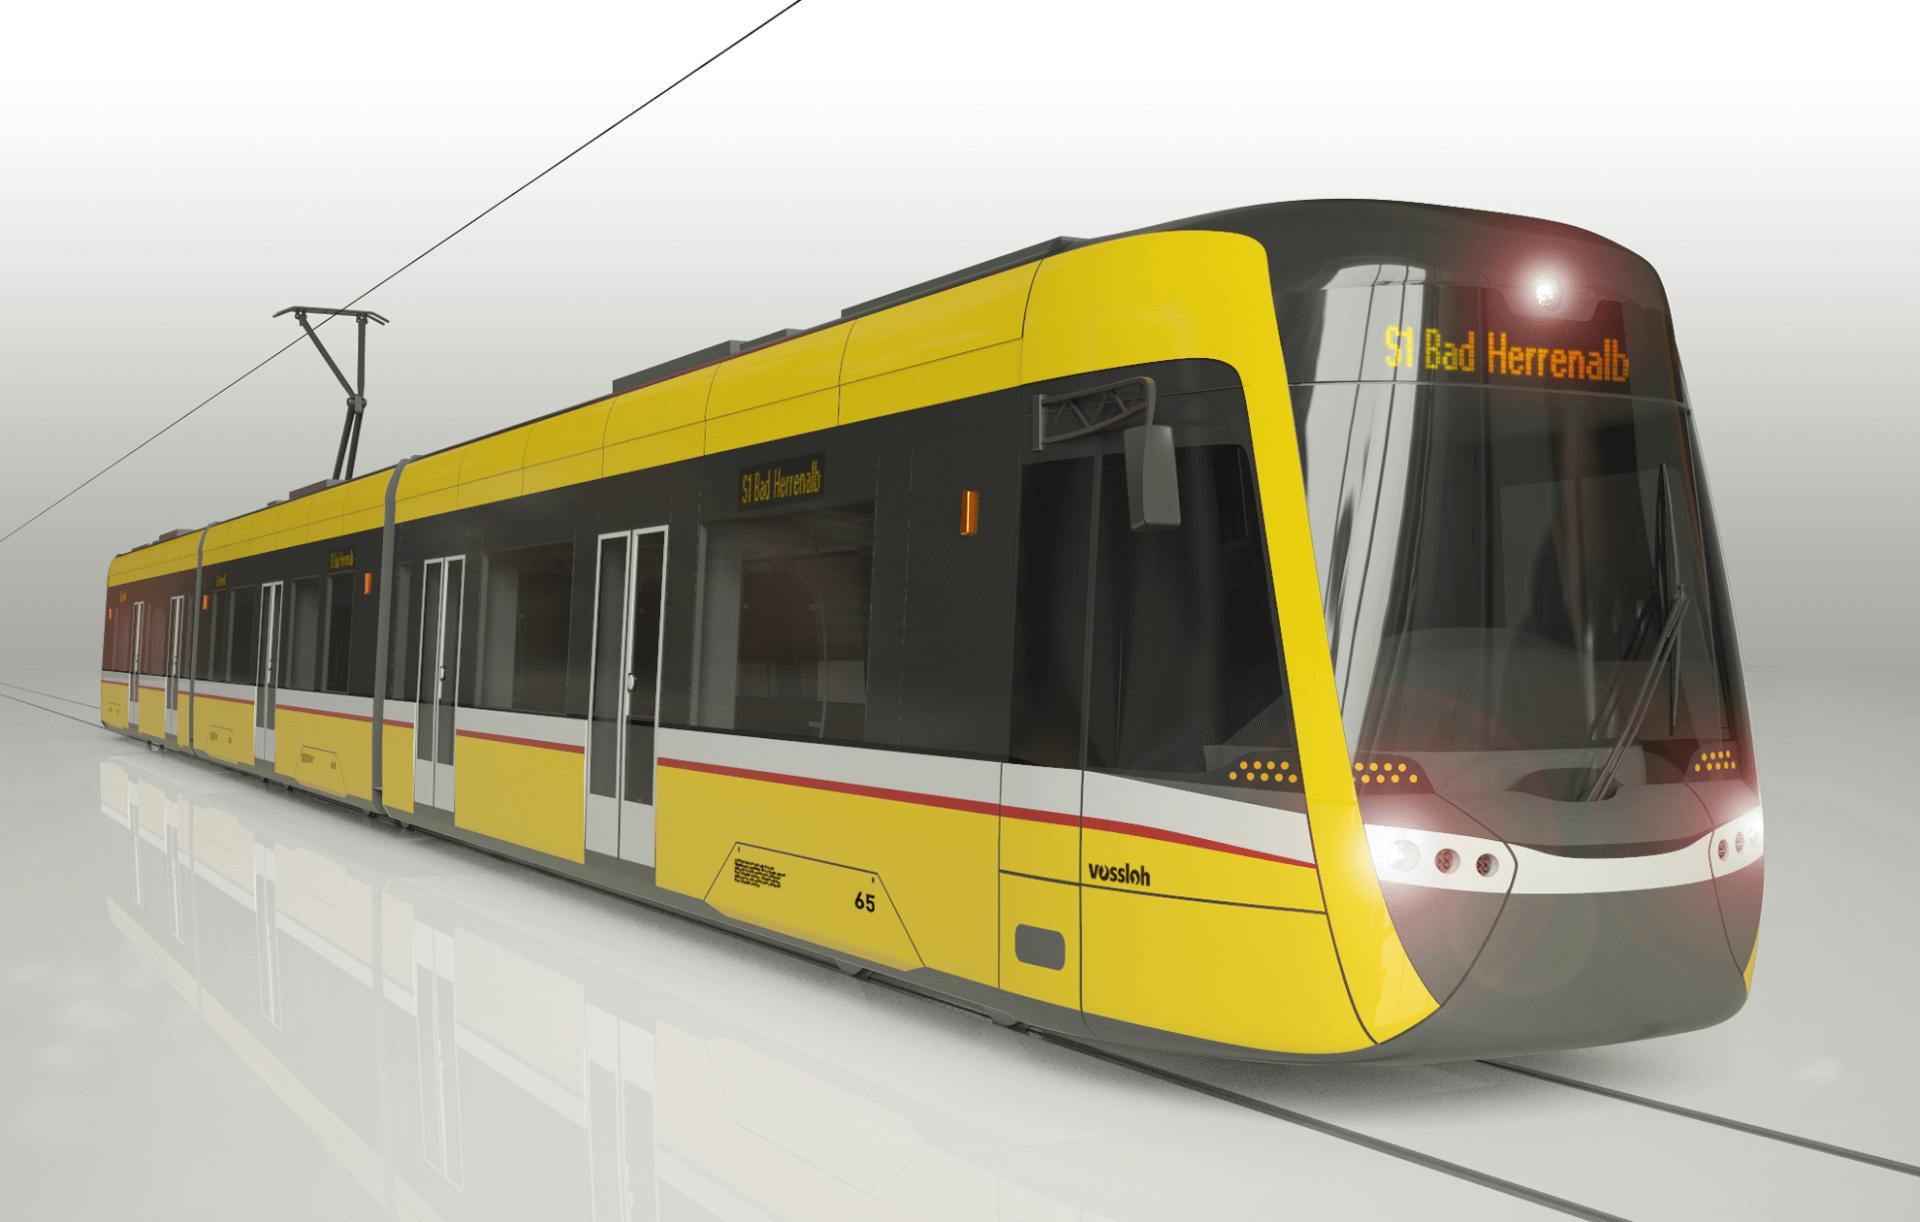 modern tram study, yellow with white backround